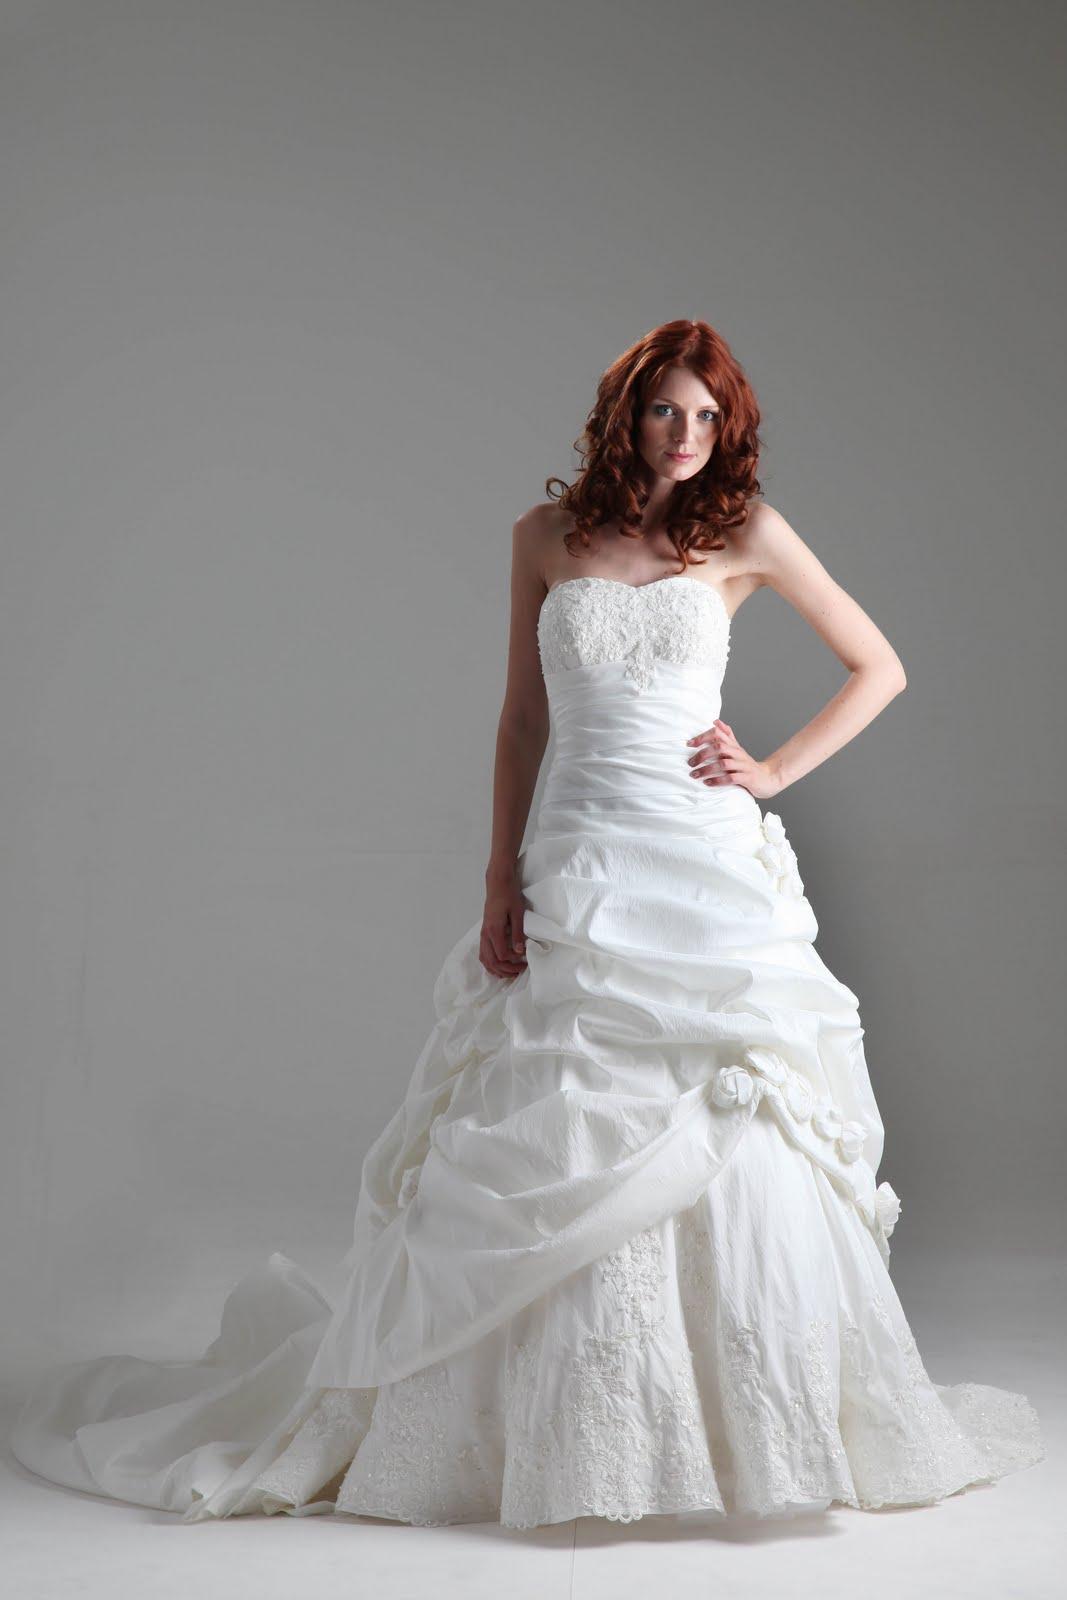 Wedding Dress Factory Outlet Leicester - Wedding Guest Dresses